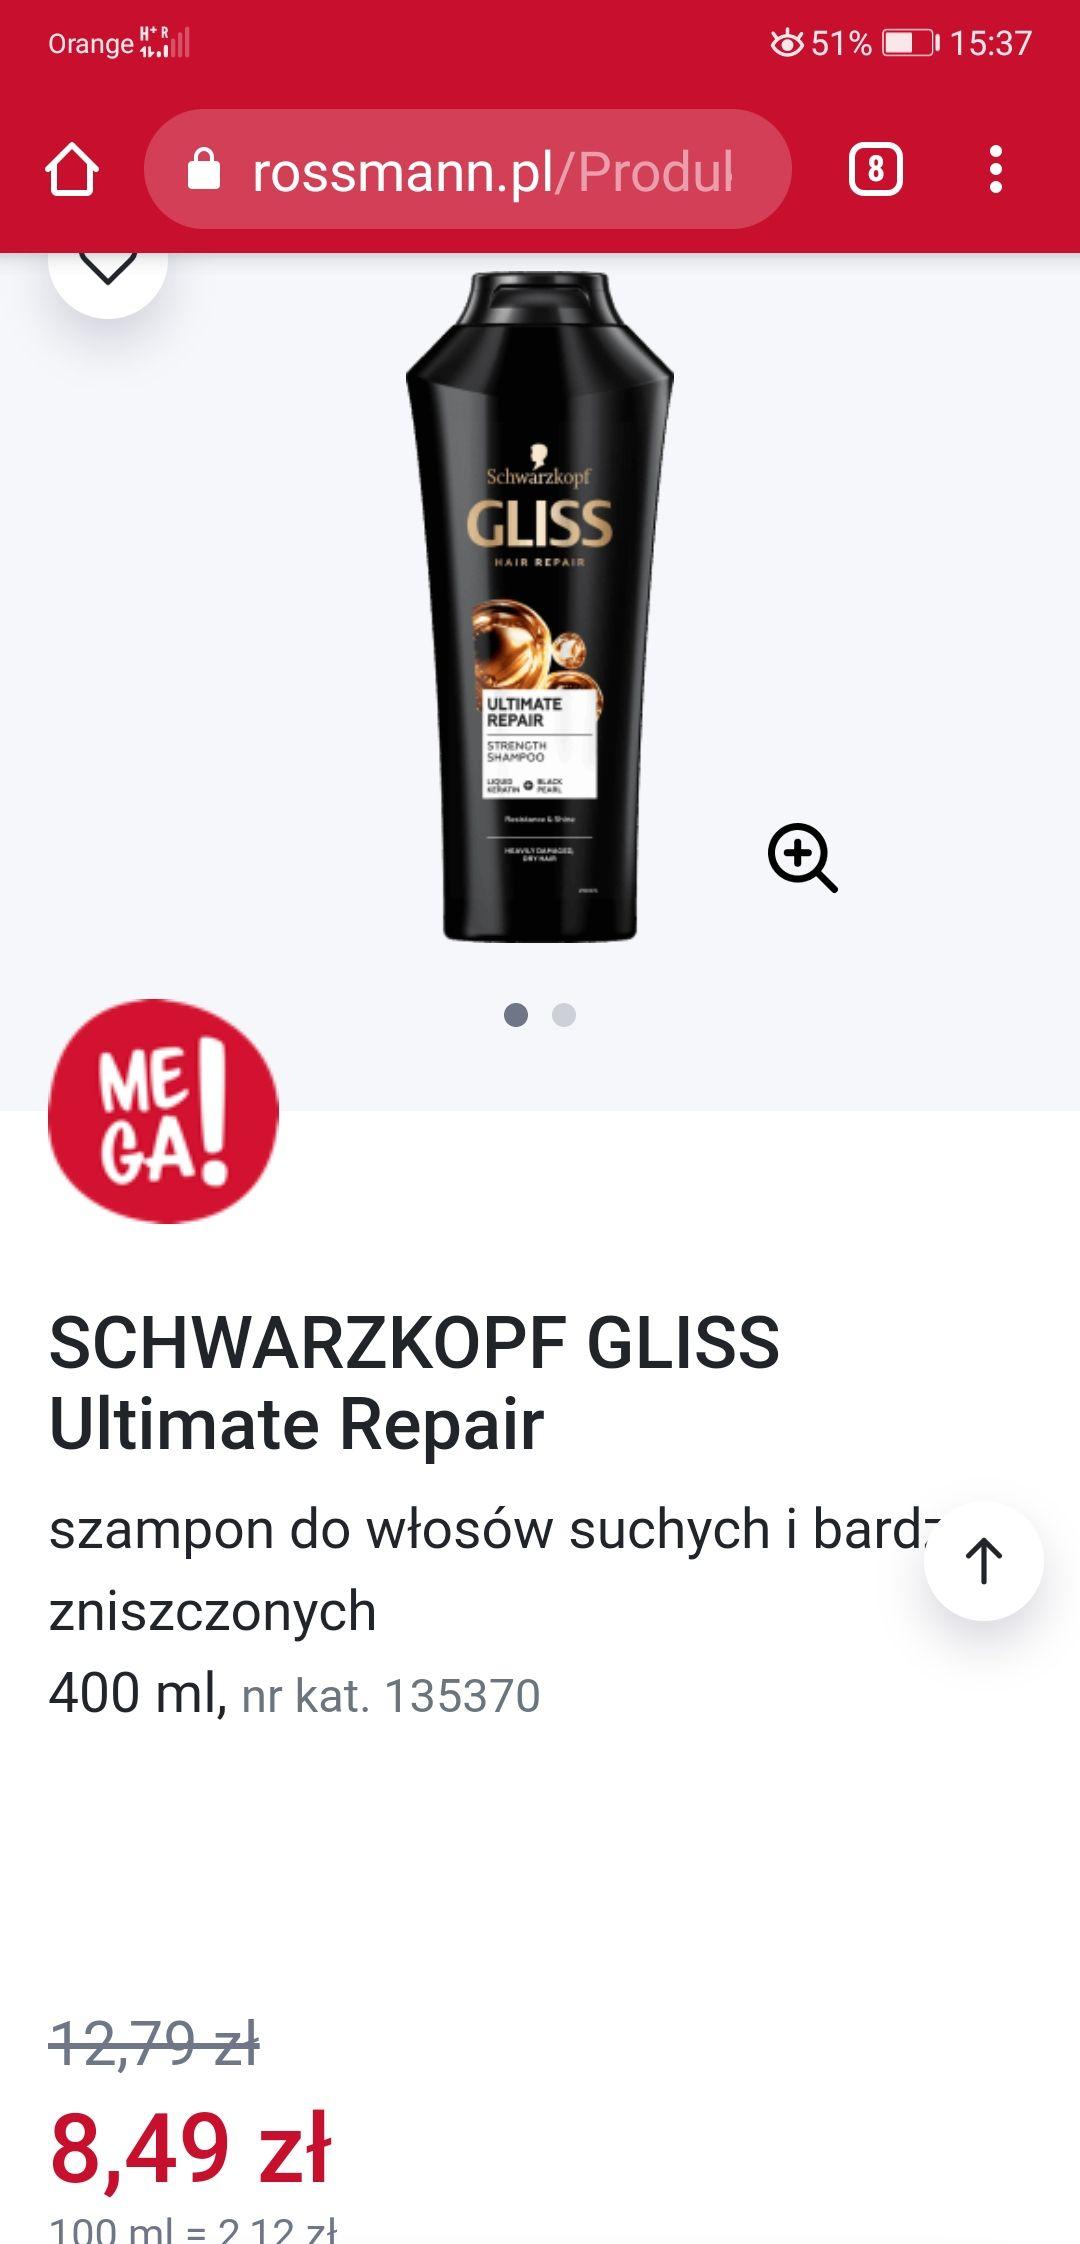 SCHWARZKOPF GLISS Ultimate